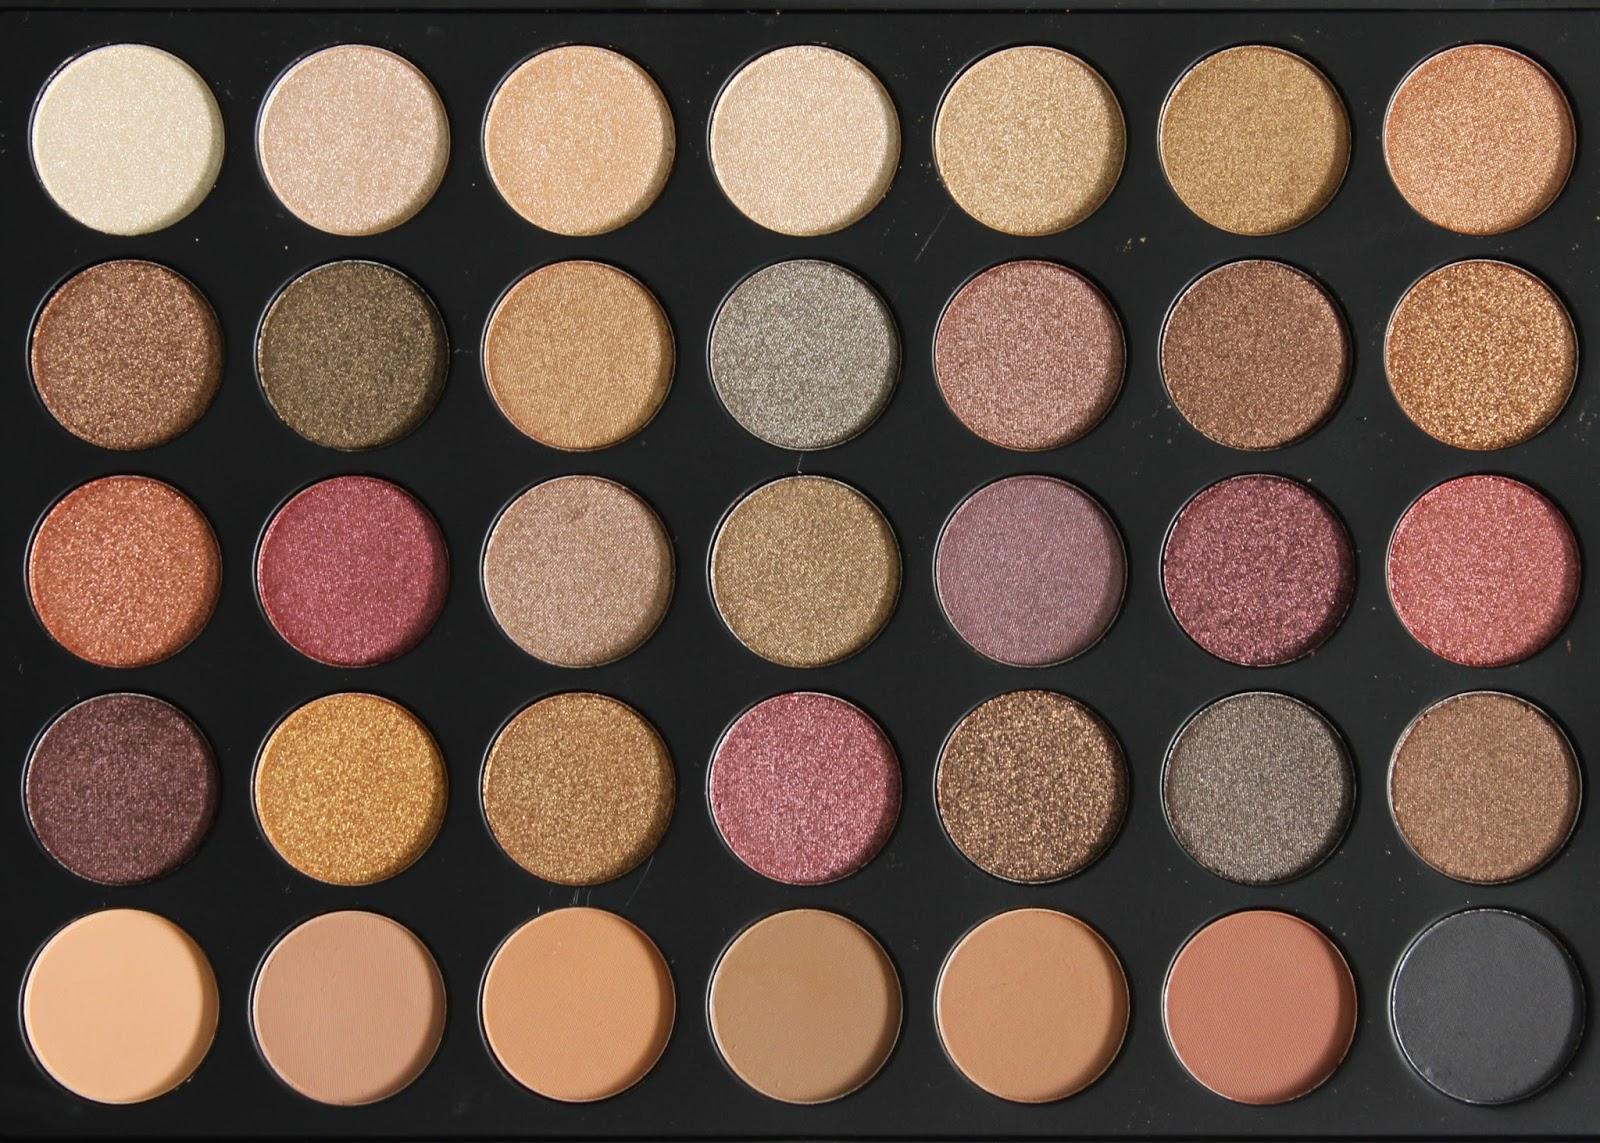 Morphe Makeup Palette Review Mugeek Vidalondon